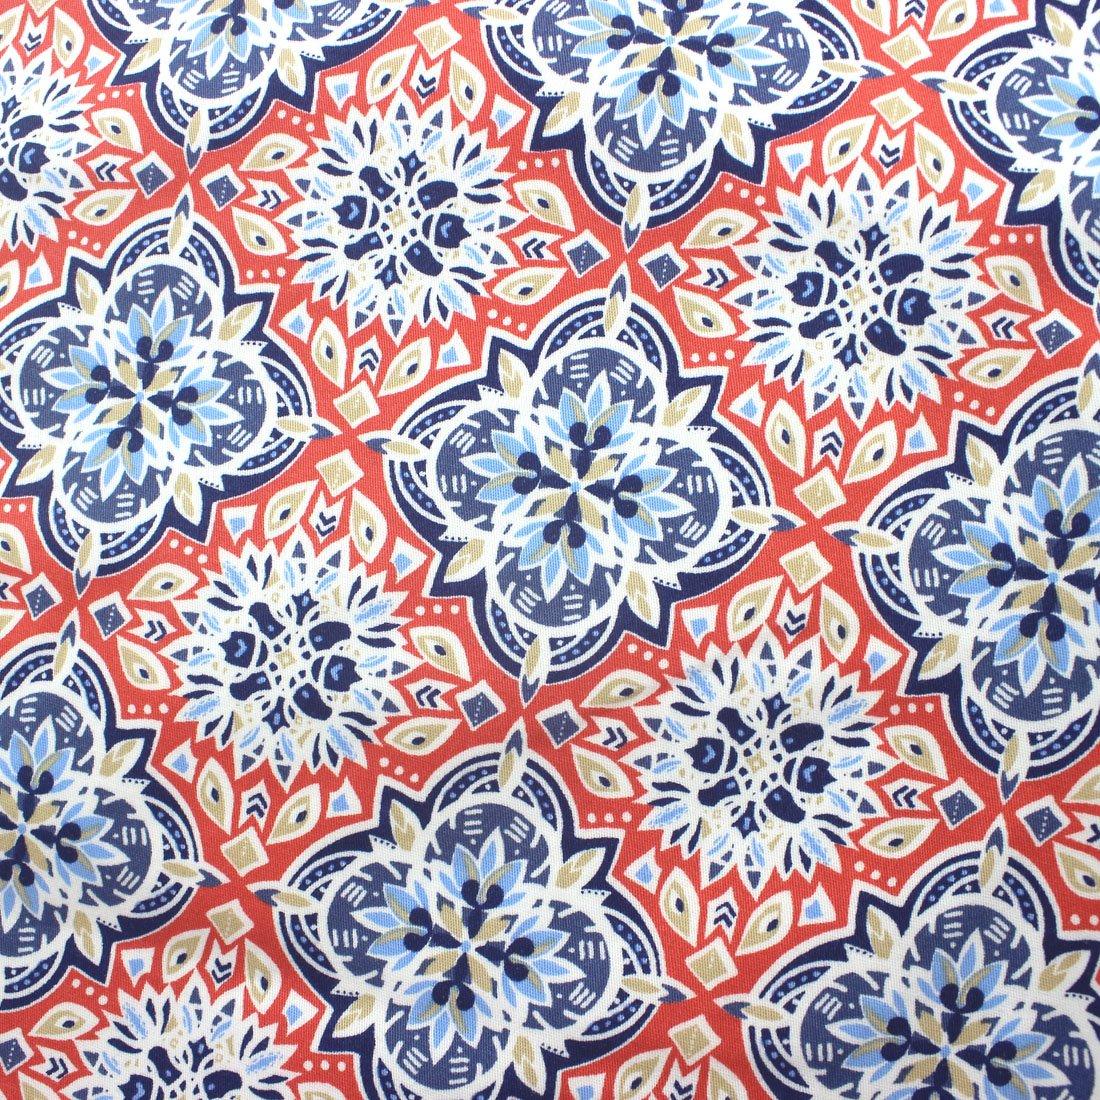 ROCK ATOLL Colorful Red Moroccan Tile Mosaic Print Slim Fit Mens Chino Shorts